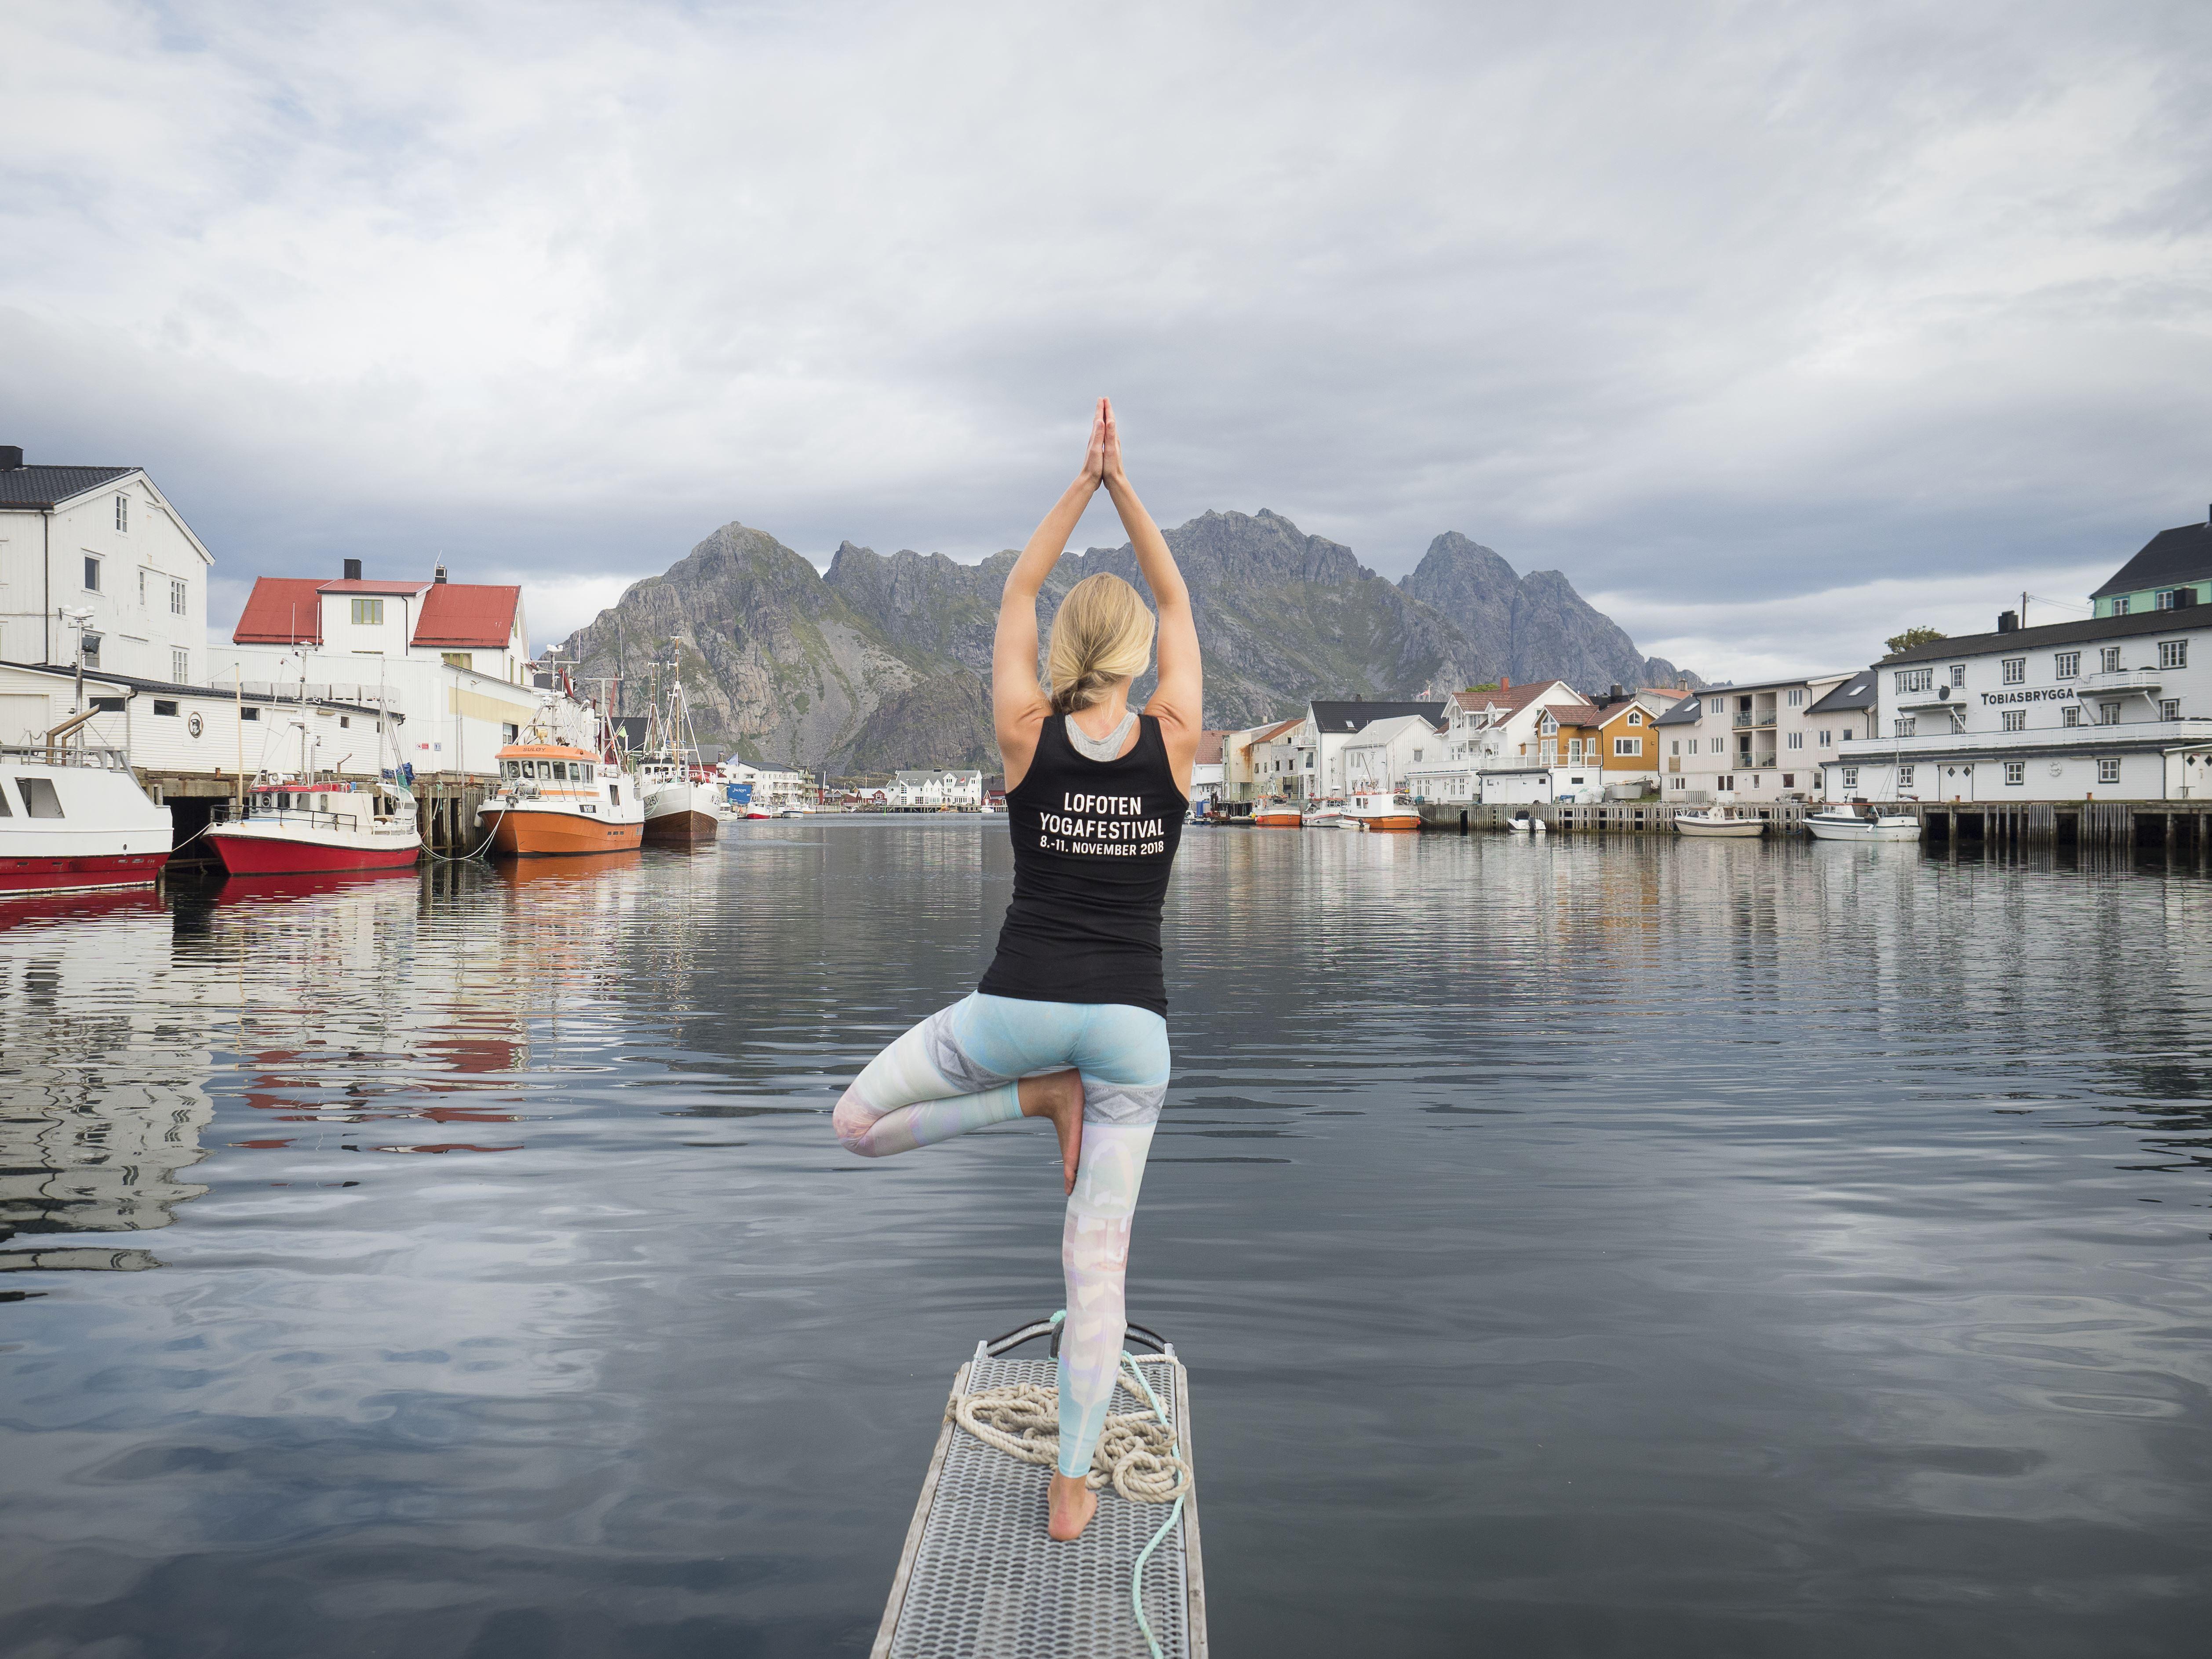 © Kristin Folsland Olsen, Lofoten Yogafestival 2018